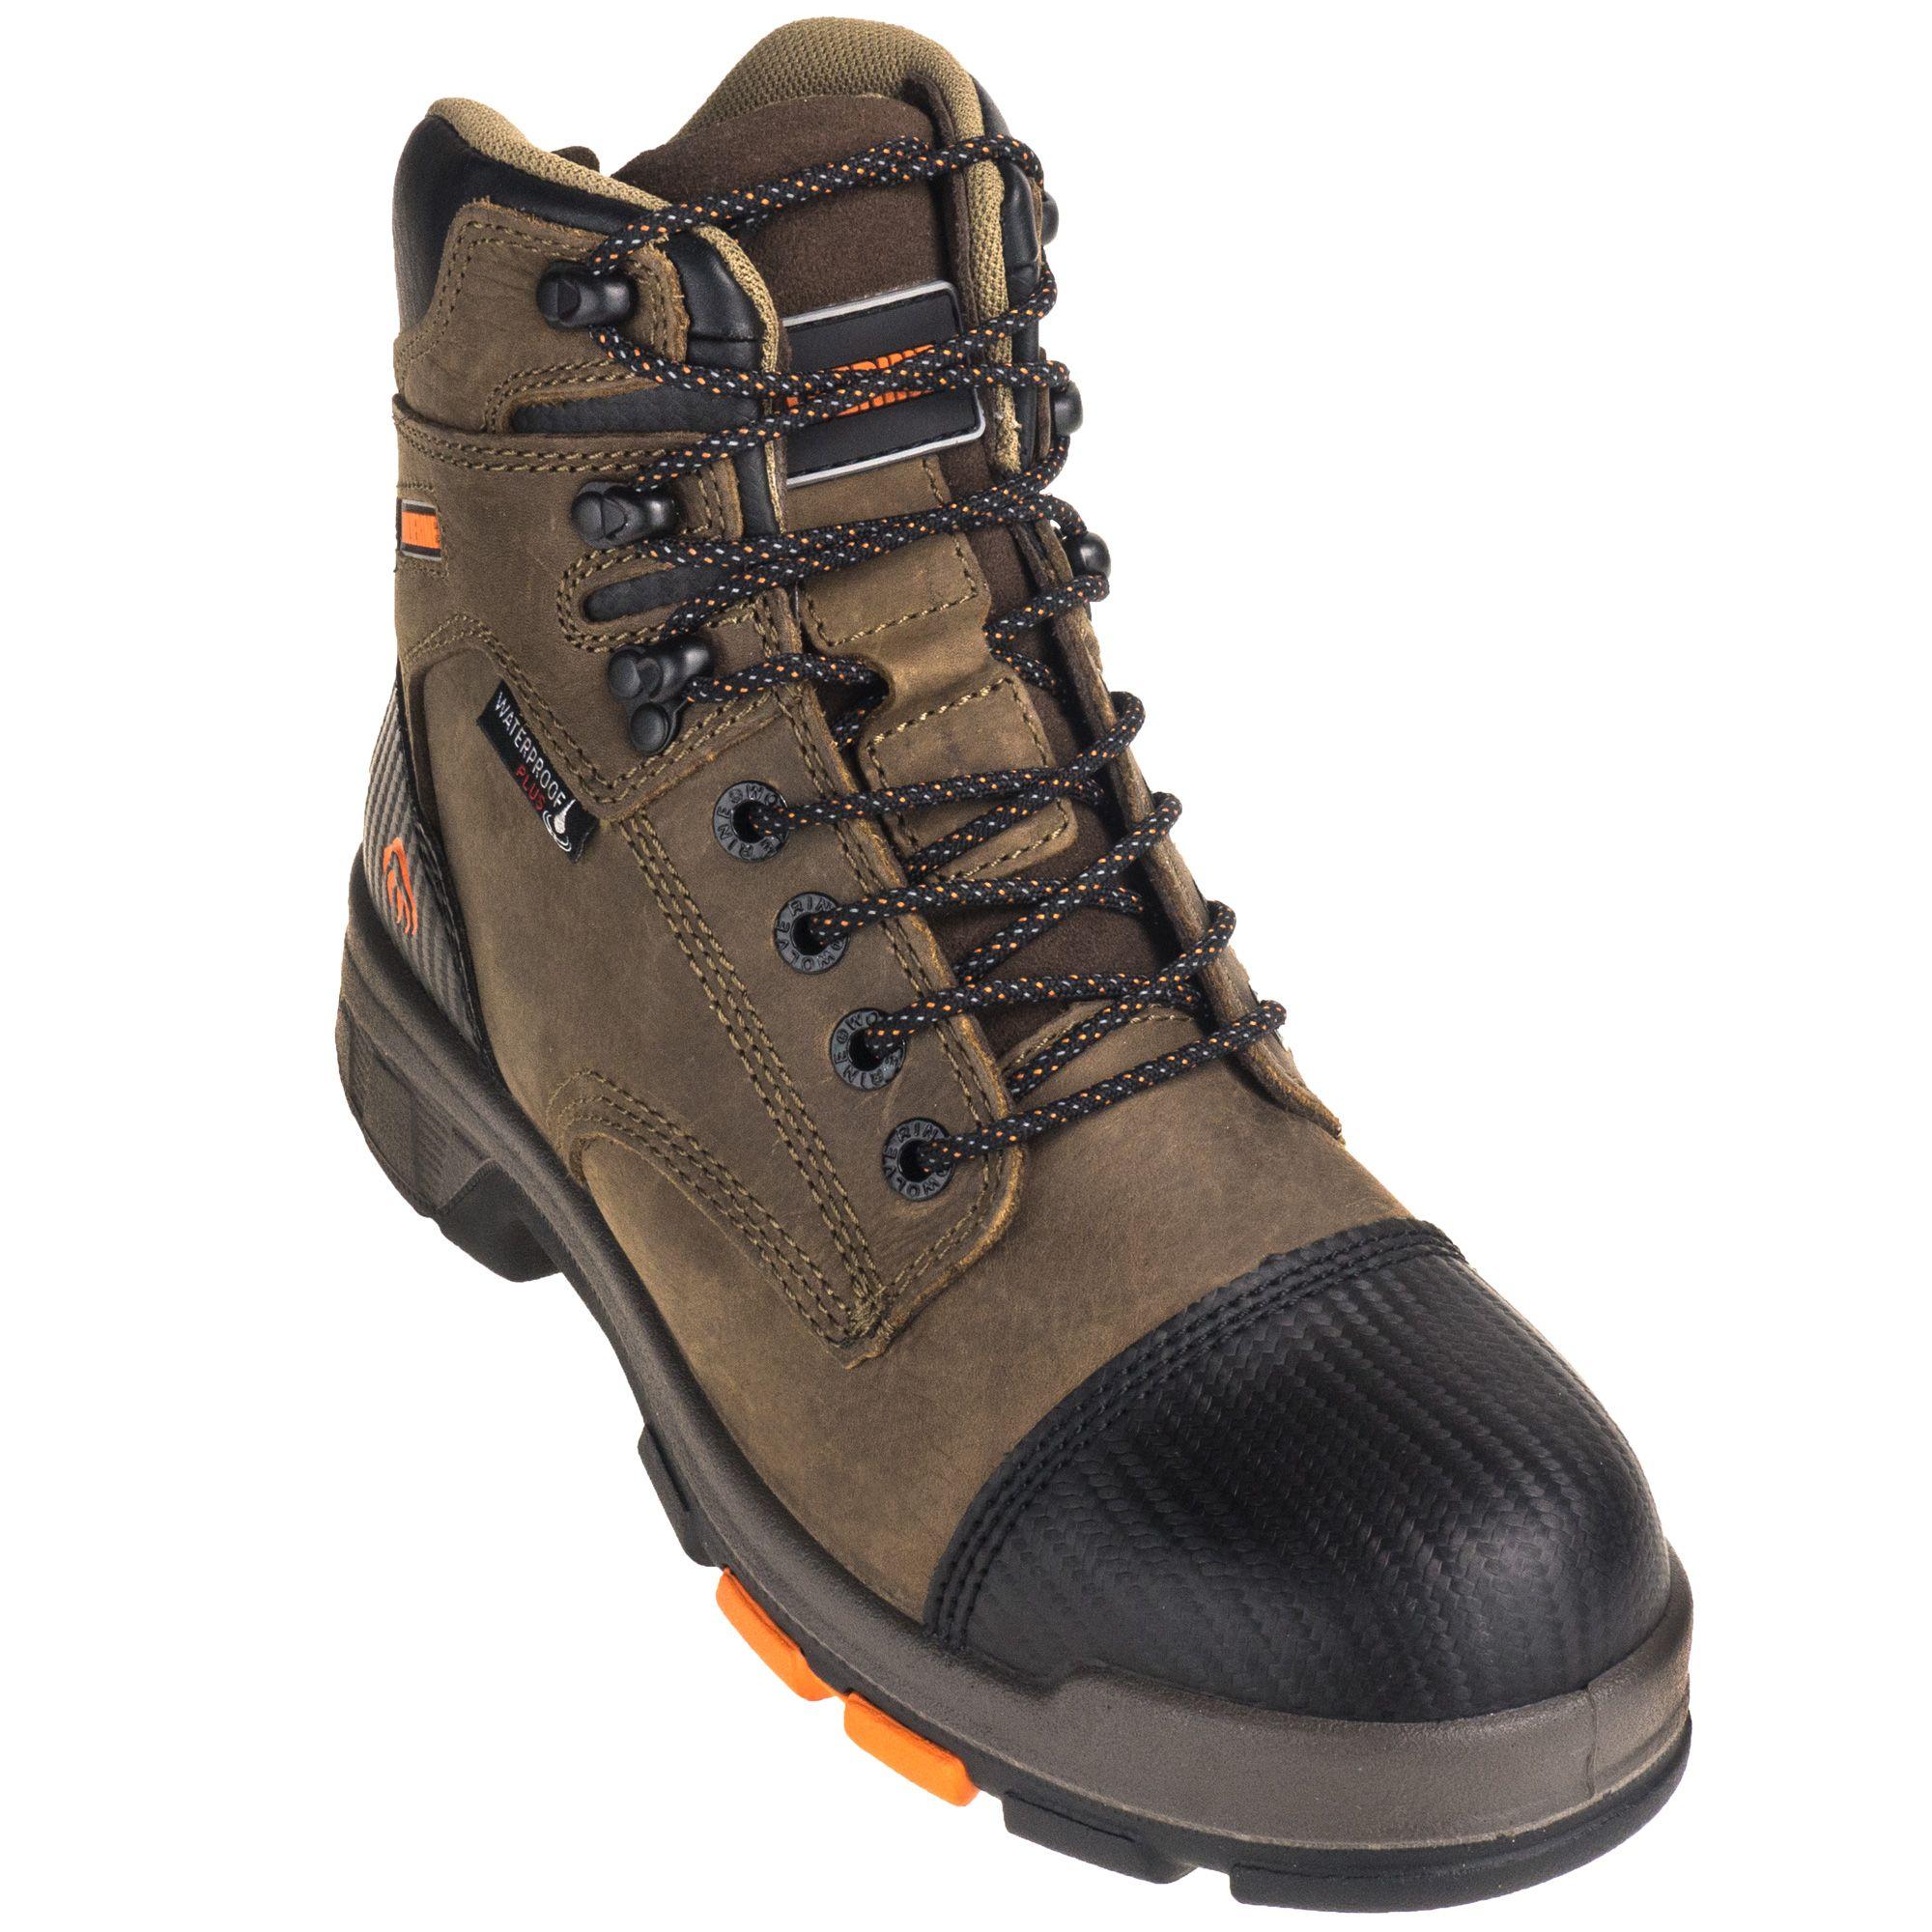 Wolverine Boots Blade LX 6 Inch Waterproof 10707 Brown